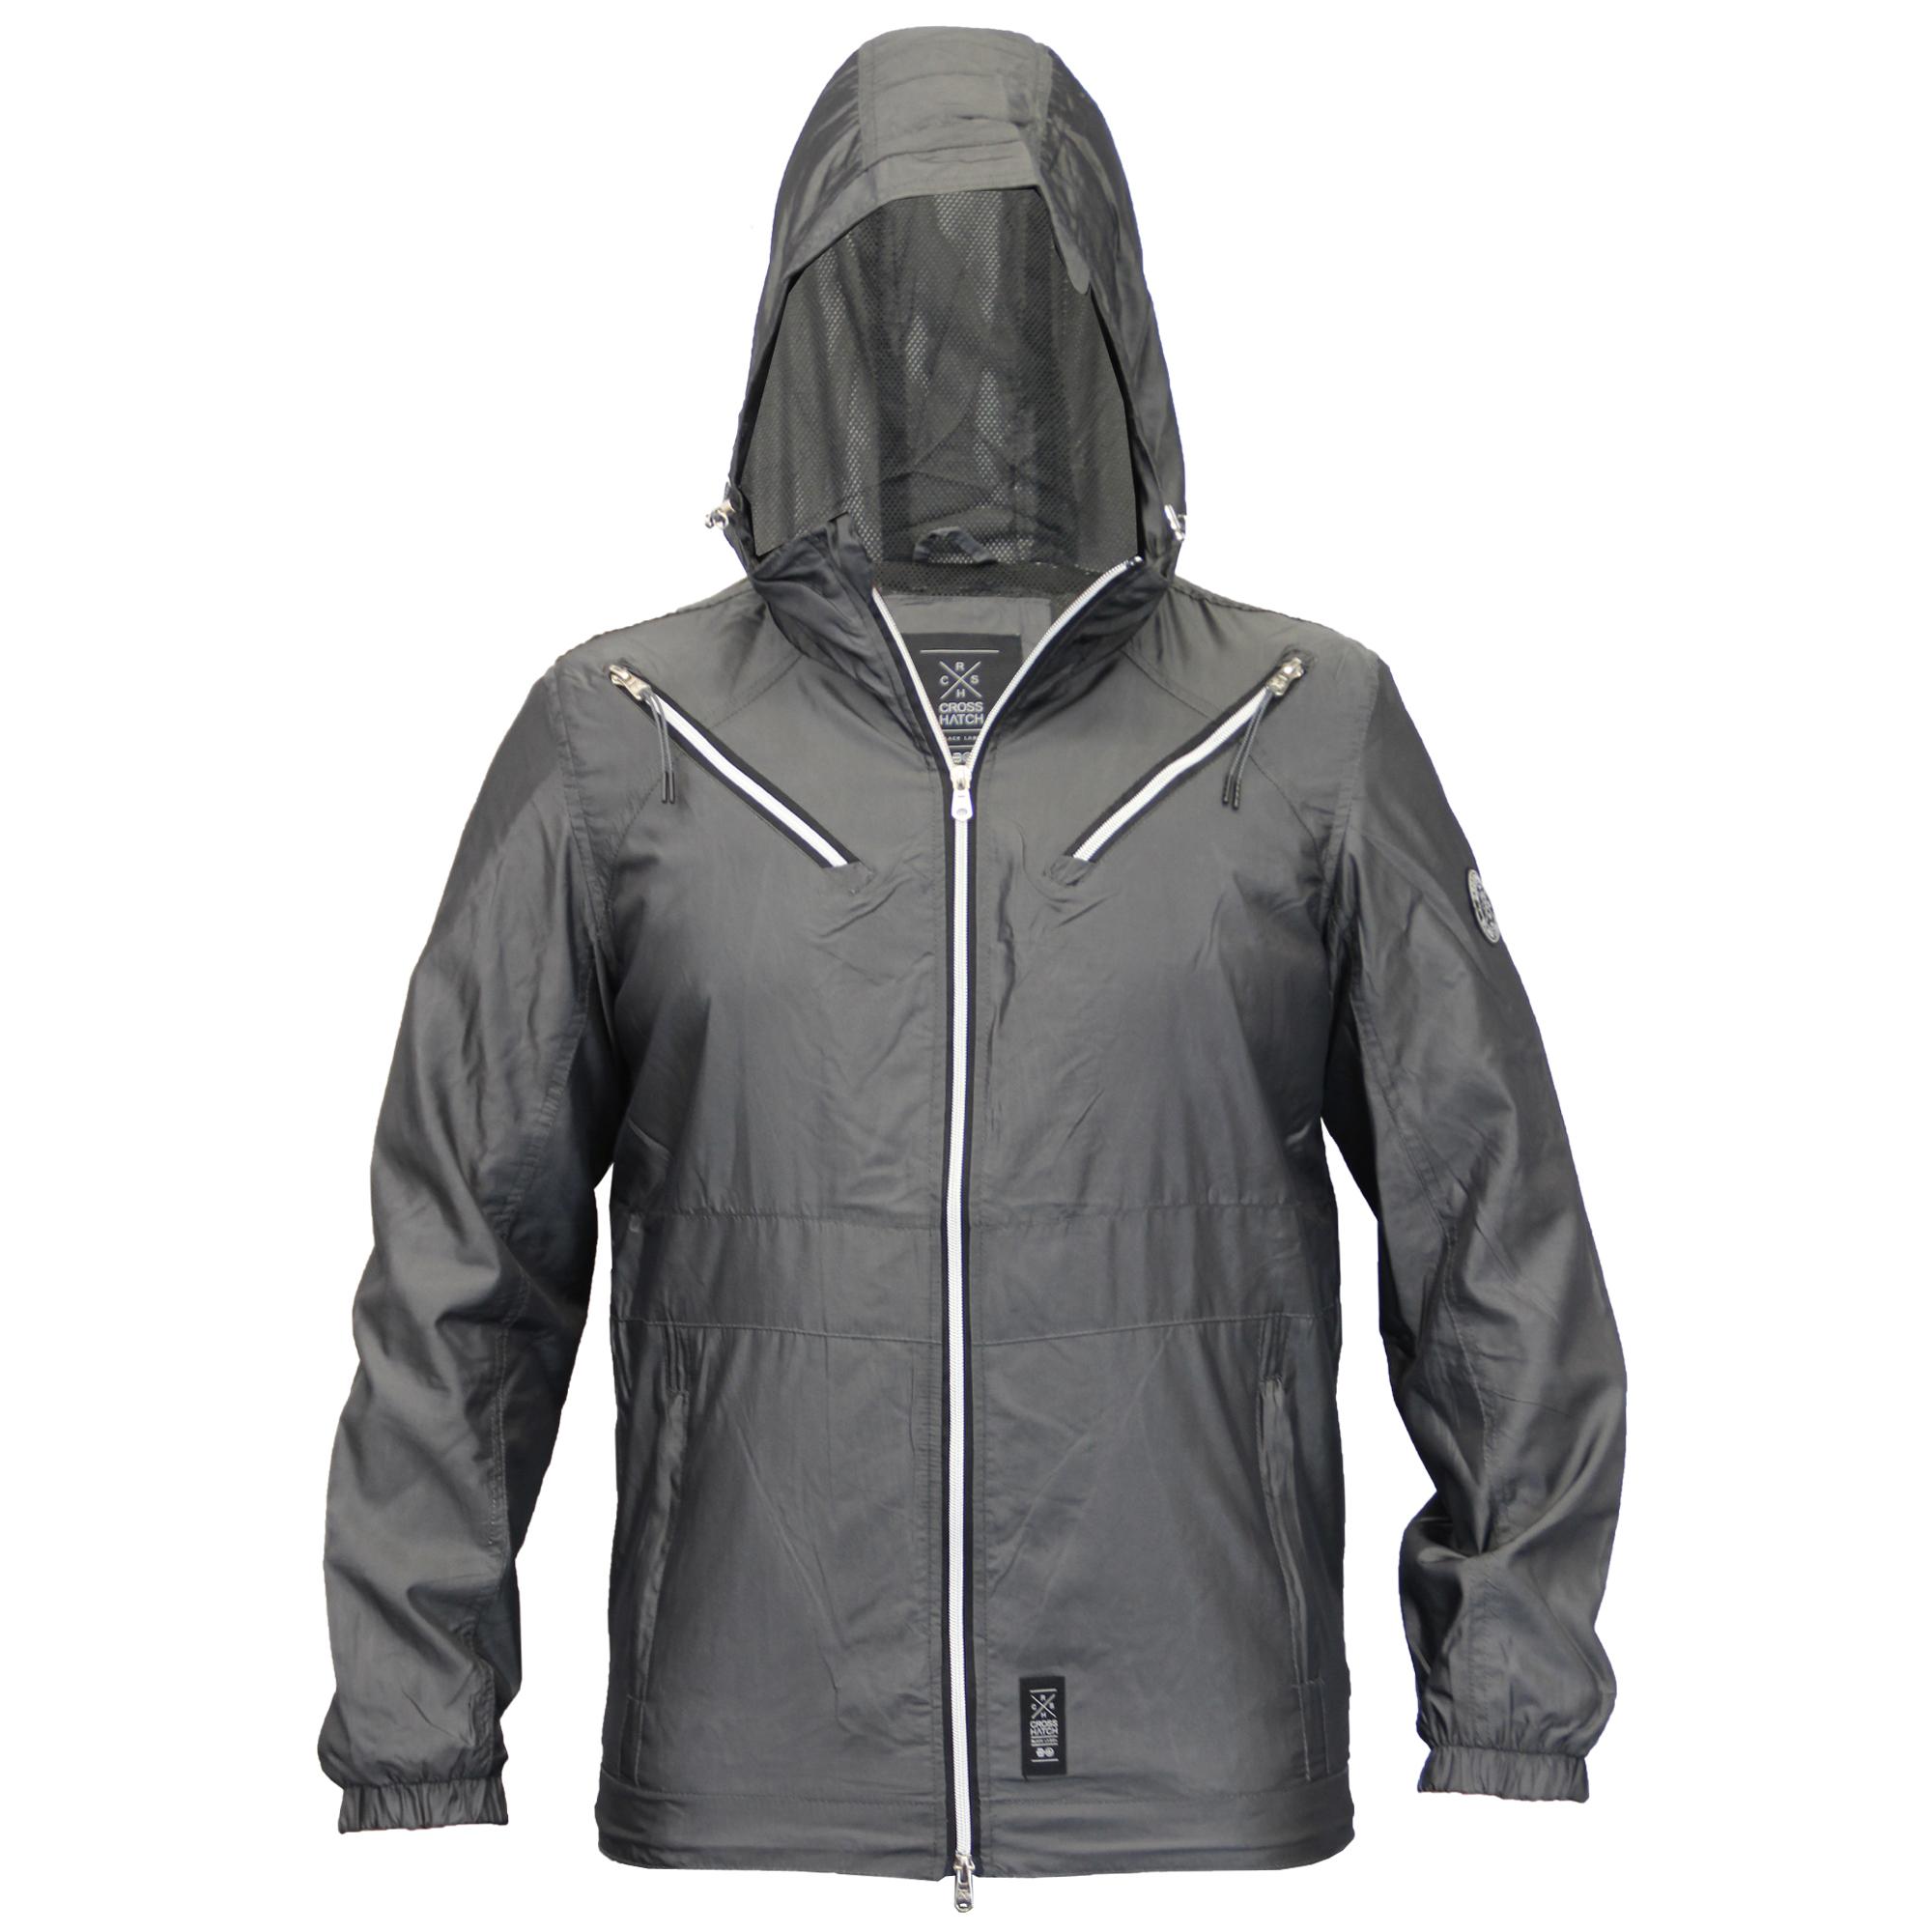 Mens-Windbreaker-Jacket-Crosshatch-Coat-Hooded-Mesh-Lined-Zip-Casual-Summer-New thumbnail 3